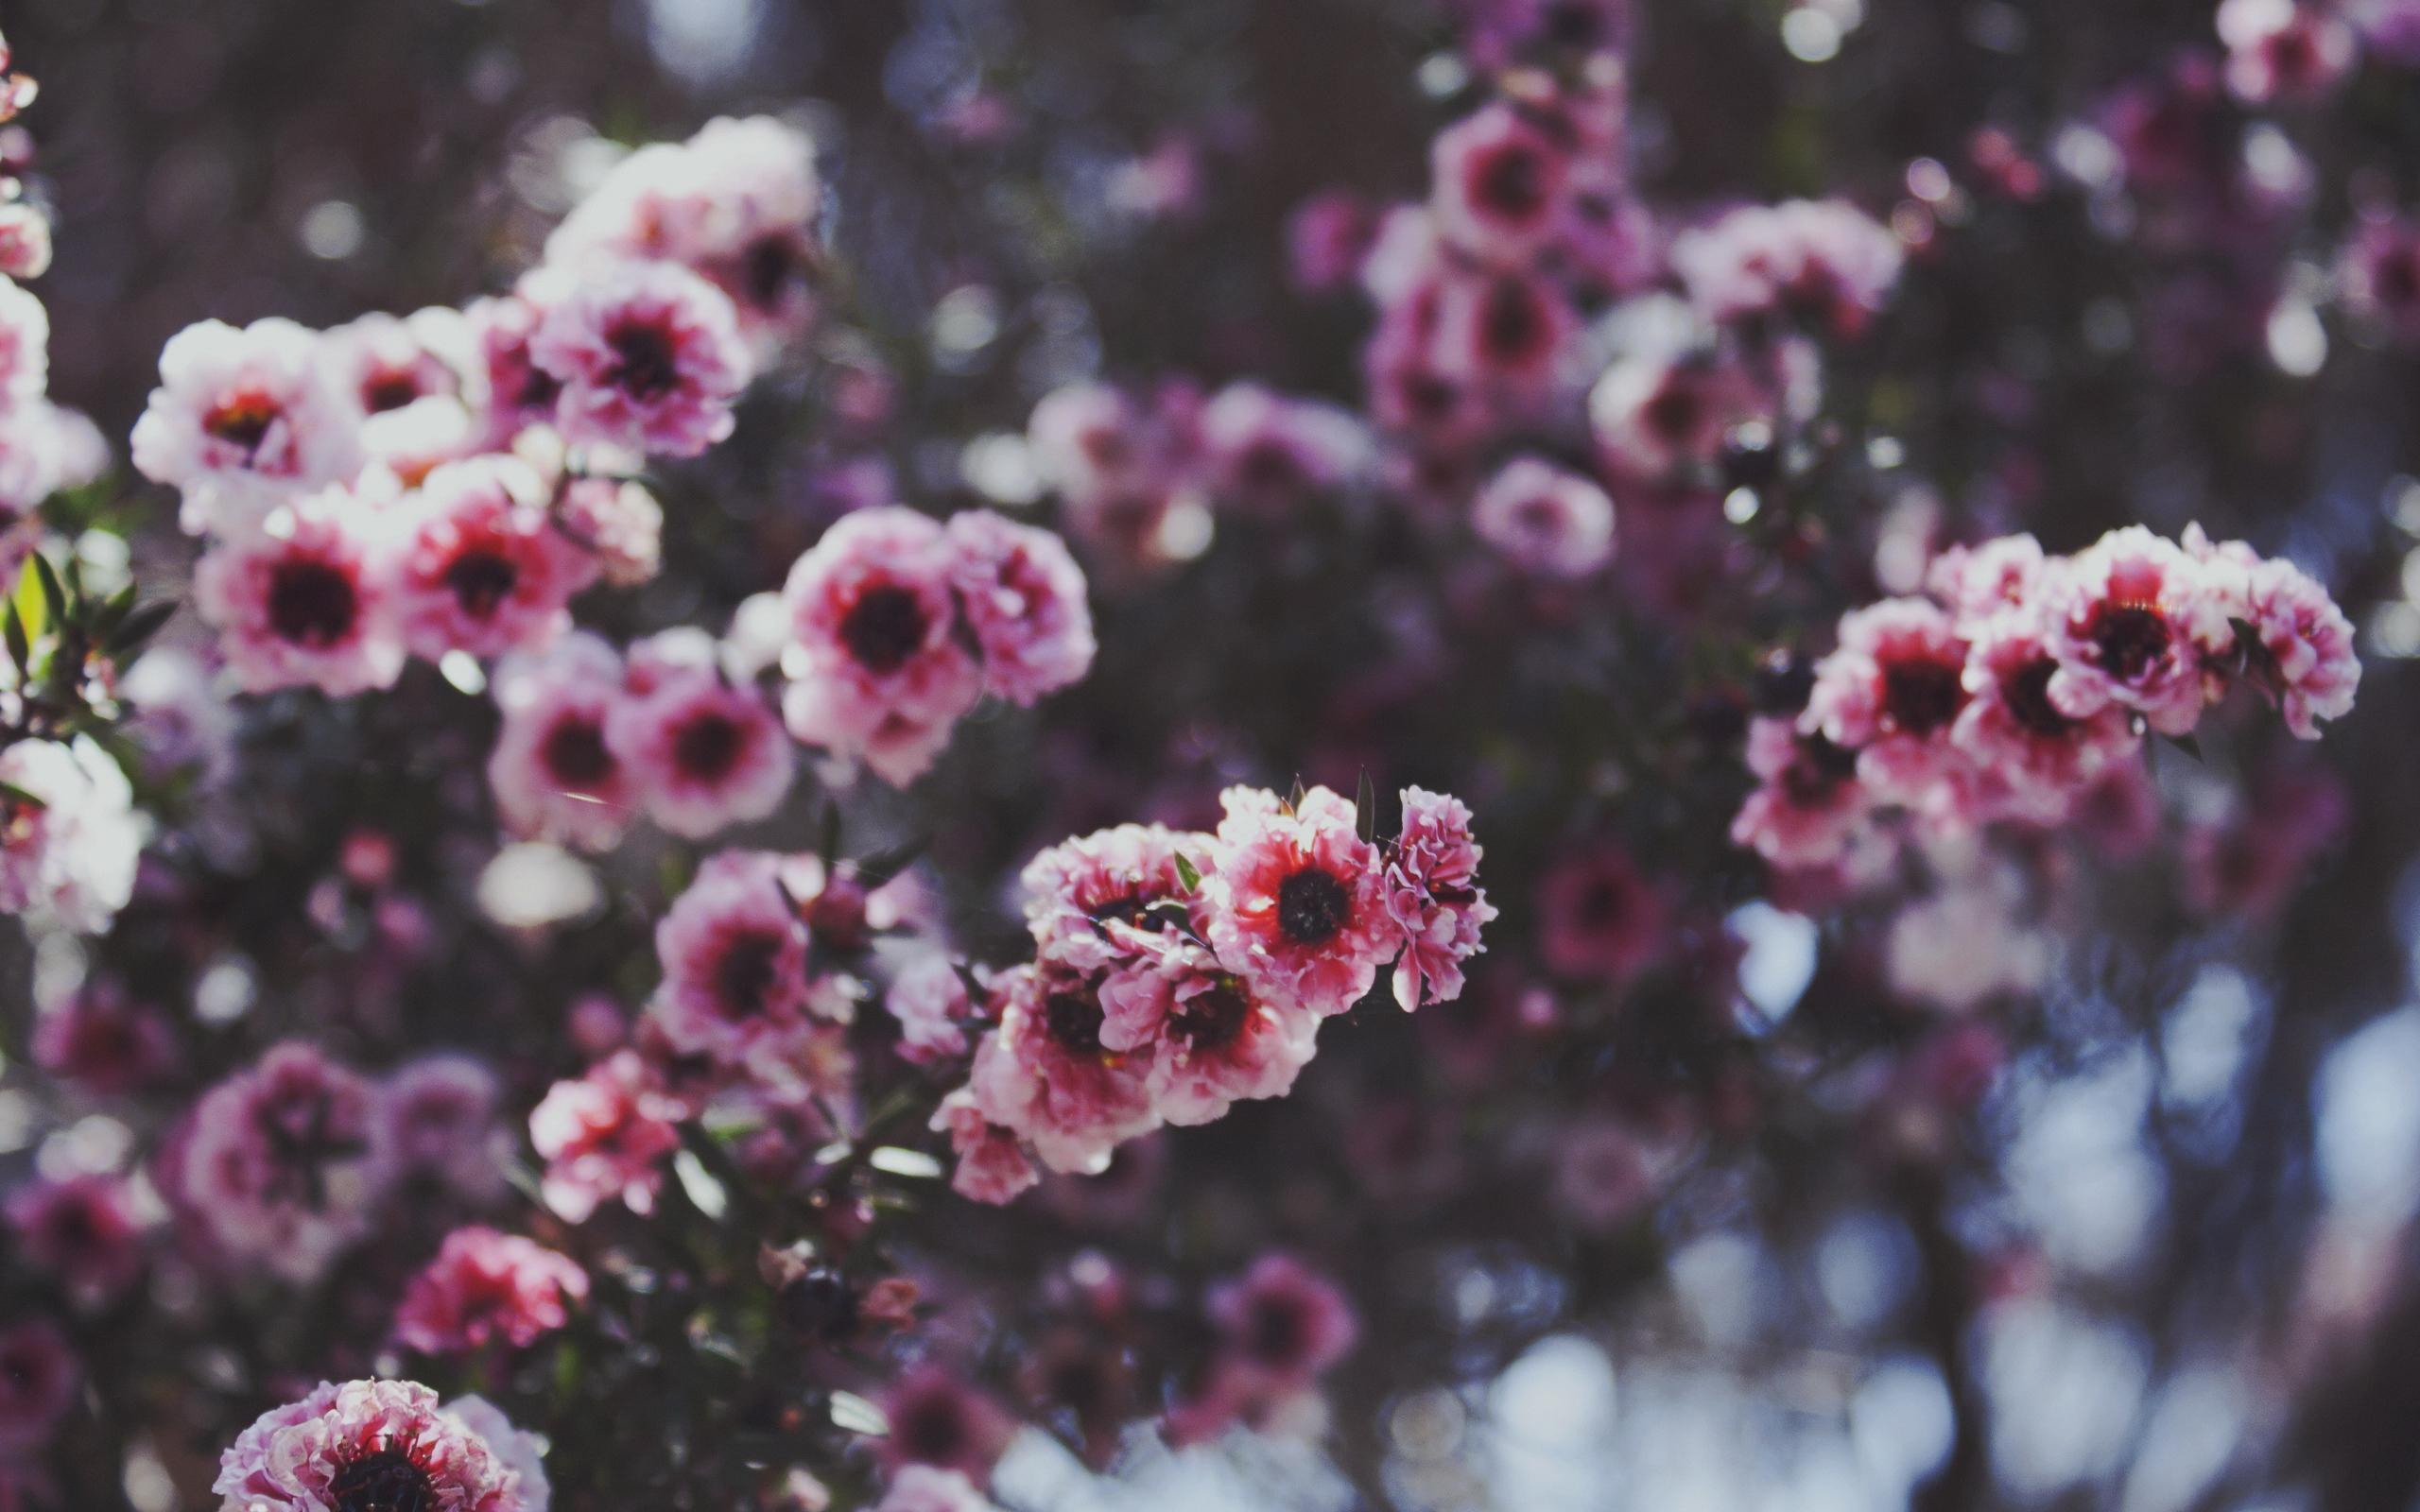 картинки для аска на фон цветы себя